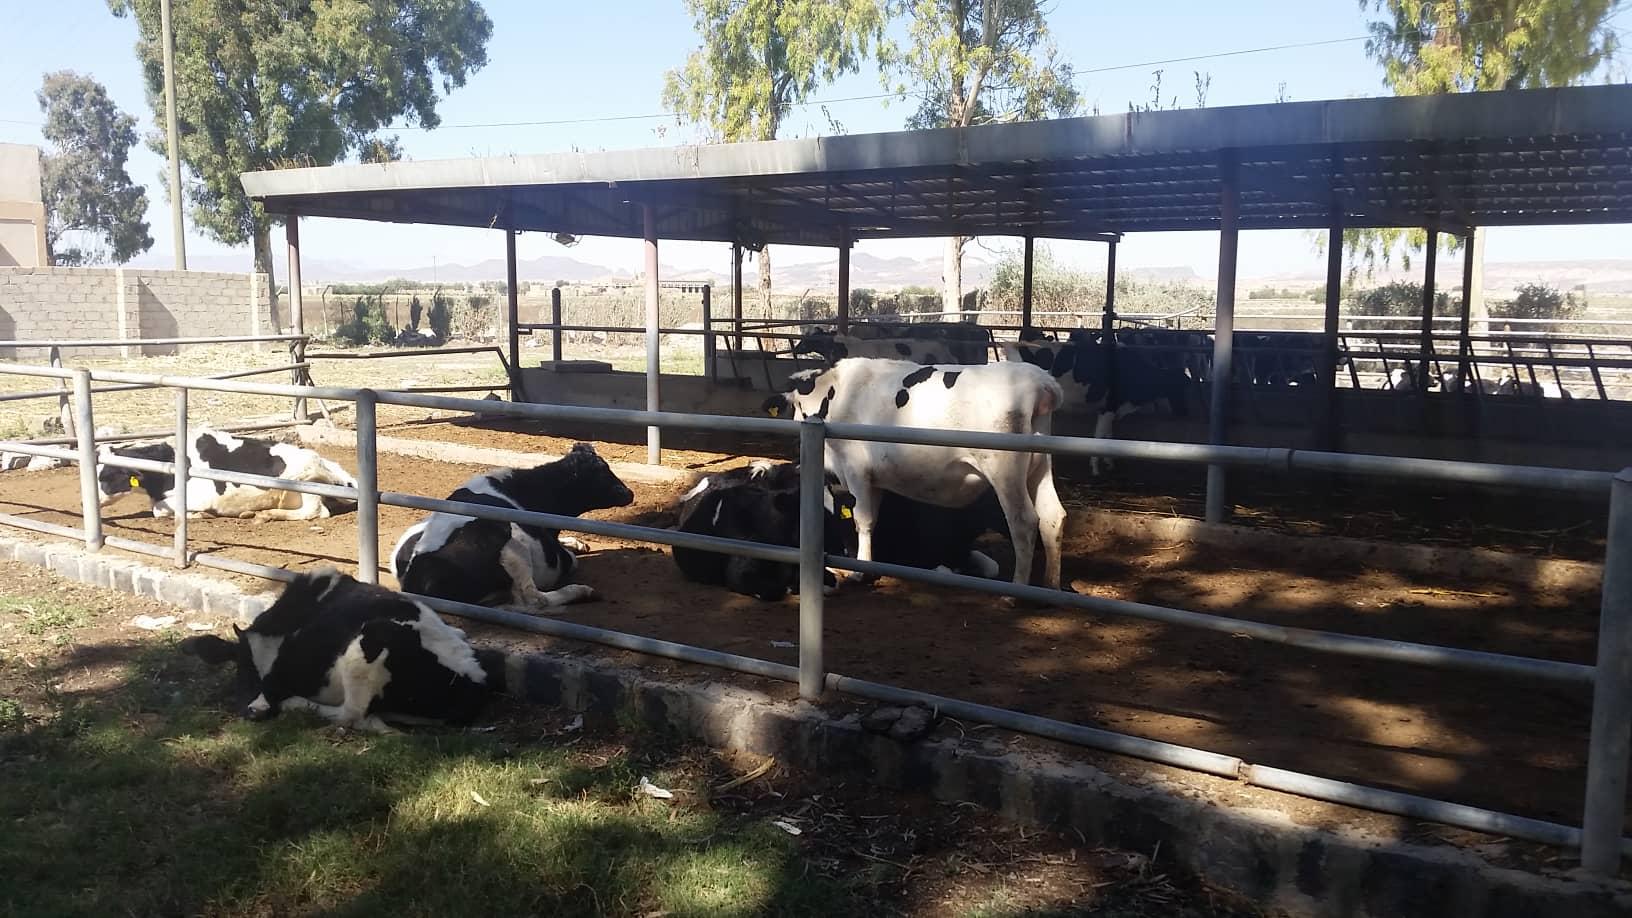 dhamar 3 nov 2018 assessment visit by hisham for OWAP AR ROSABAH FARM RESCUE YEMEN.jpg